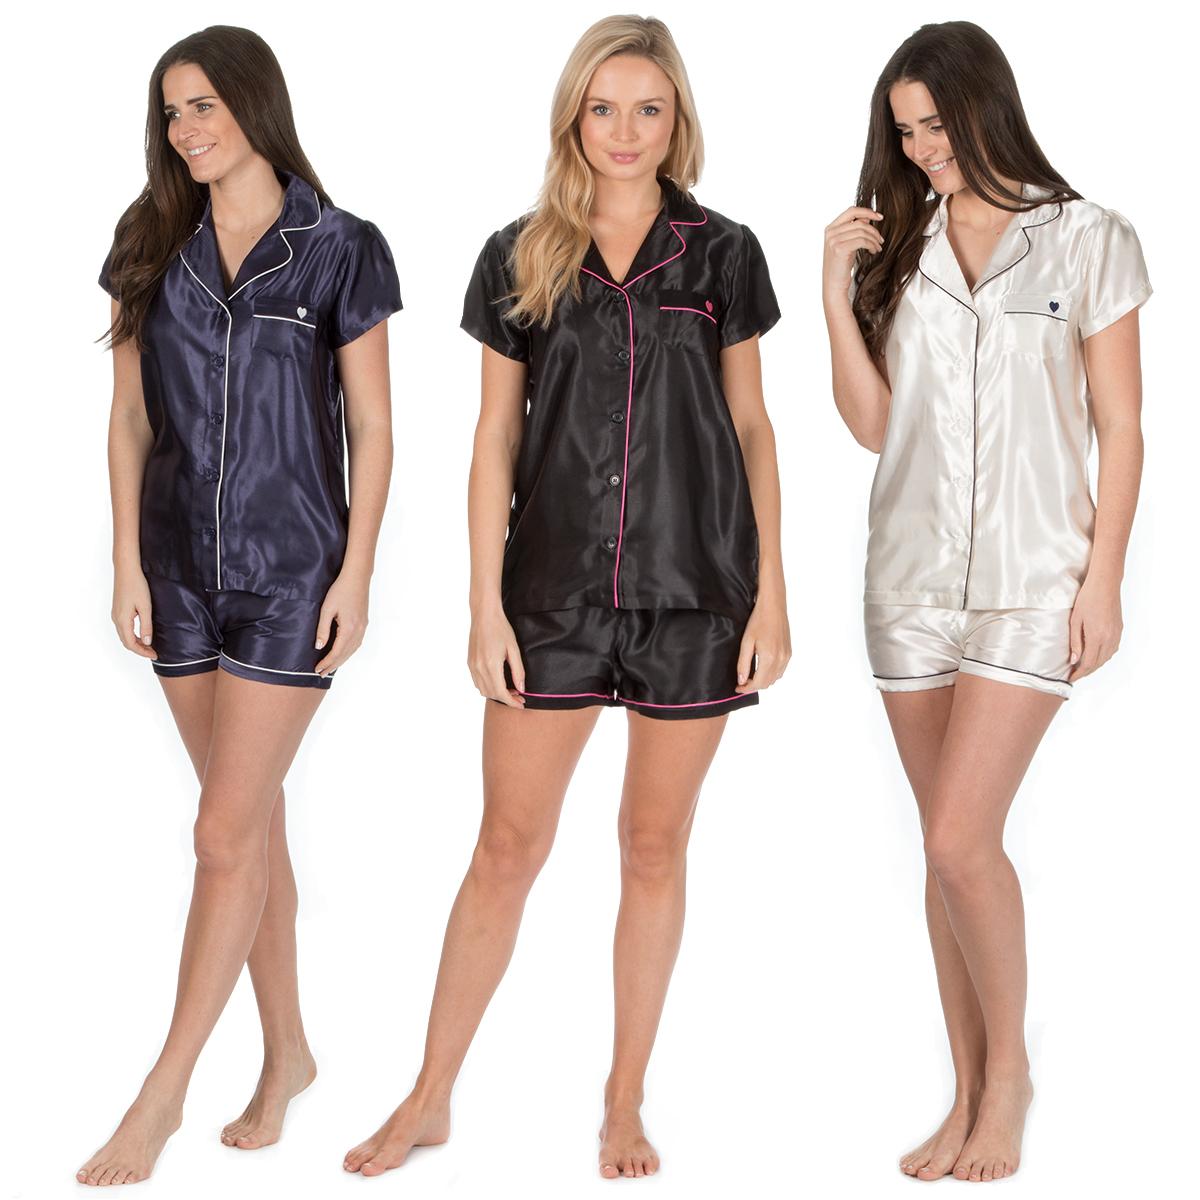 Womens Ladies Satin Pajama Set Short Sleeved Nightwear Shorts Summer  Loungewear 996e90a90